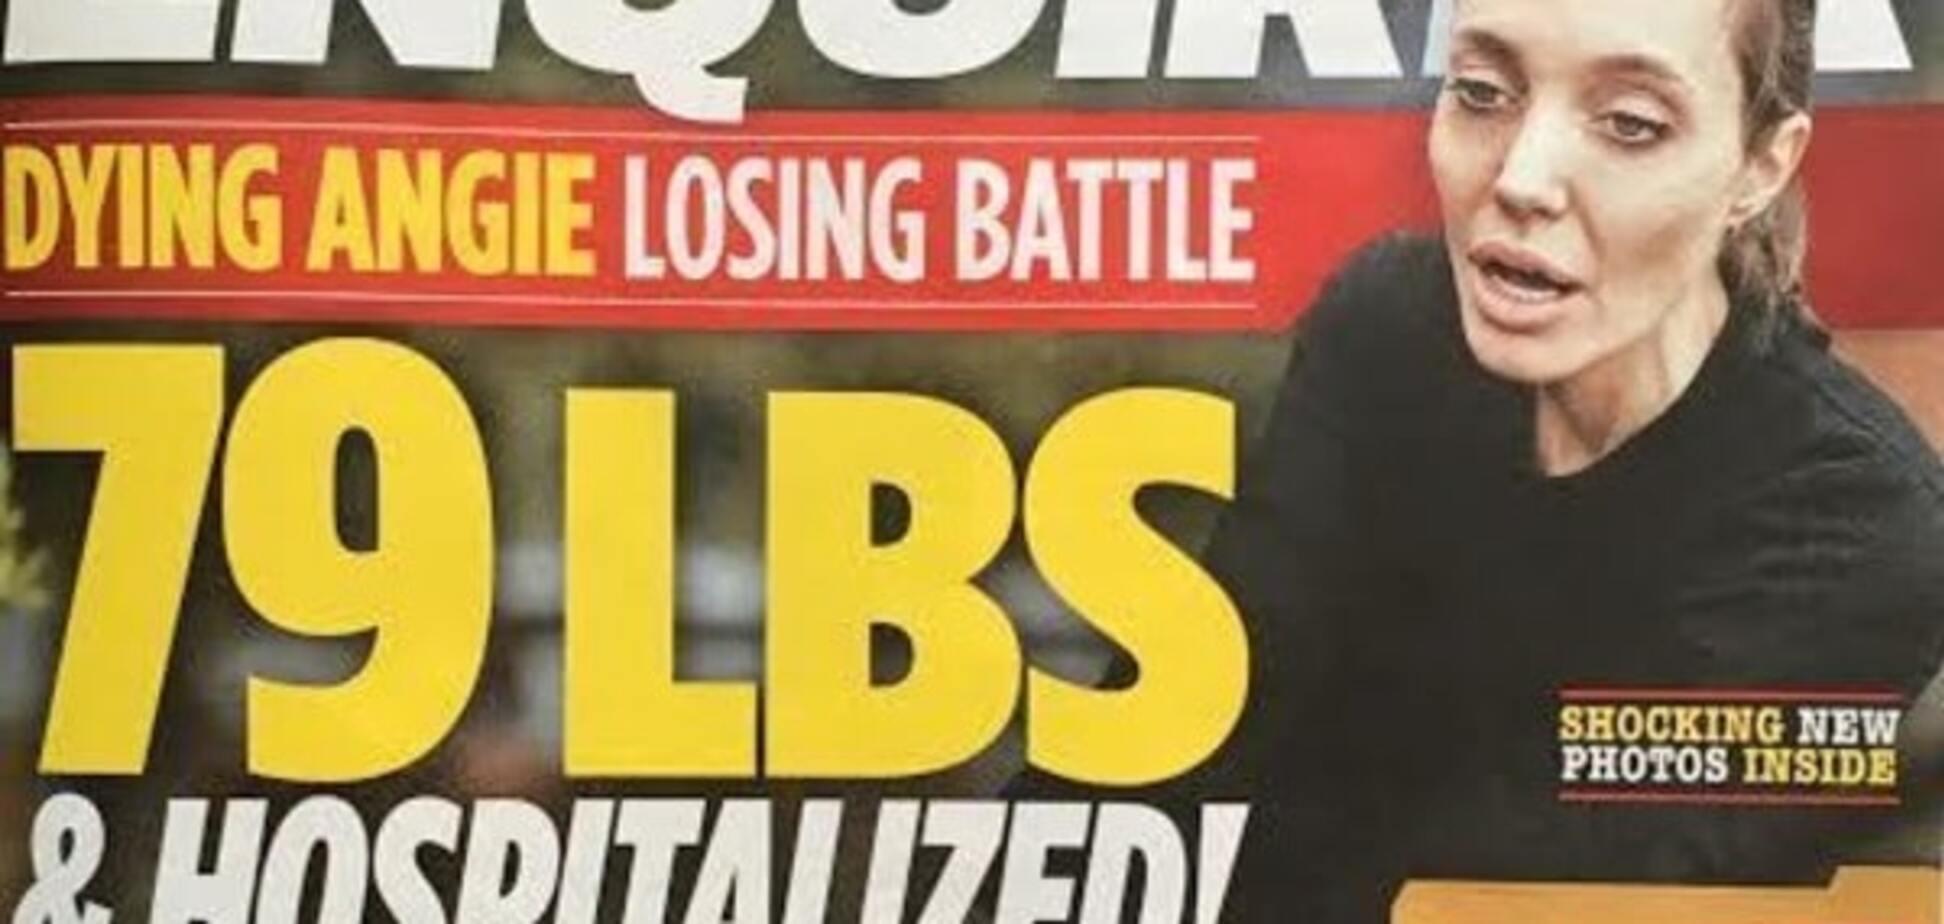 'Помираючи, Джолі програє битву': National Enquirer шокував новими фото актриси